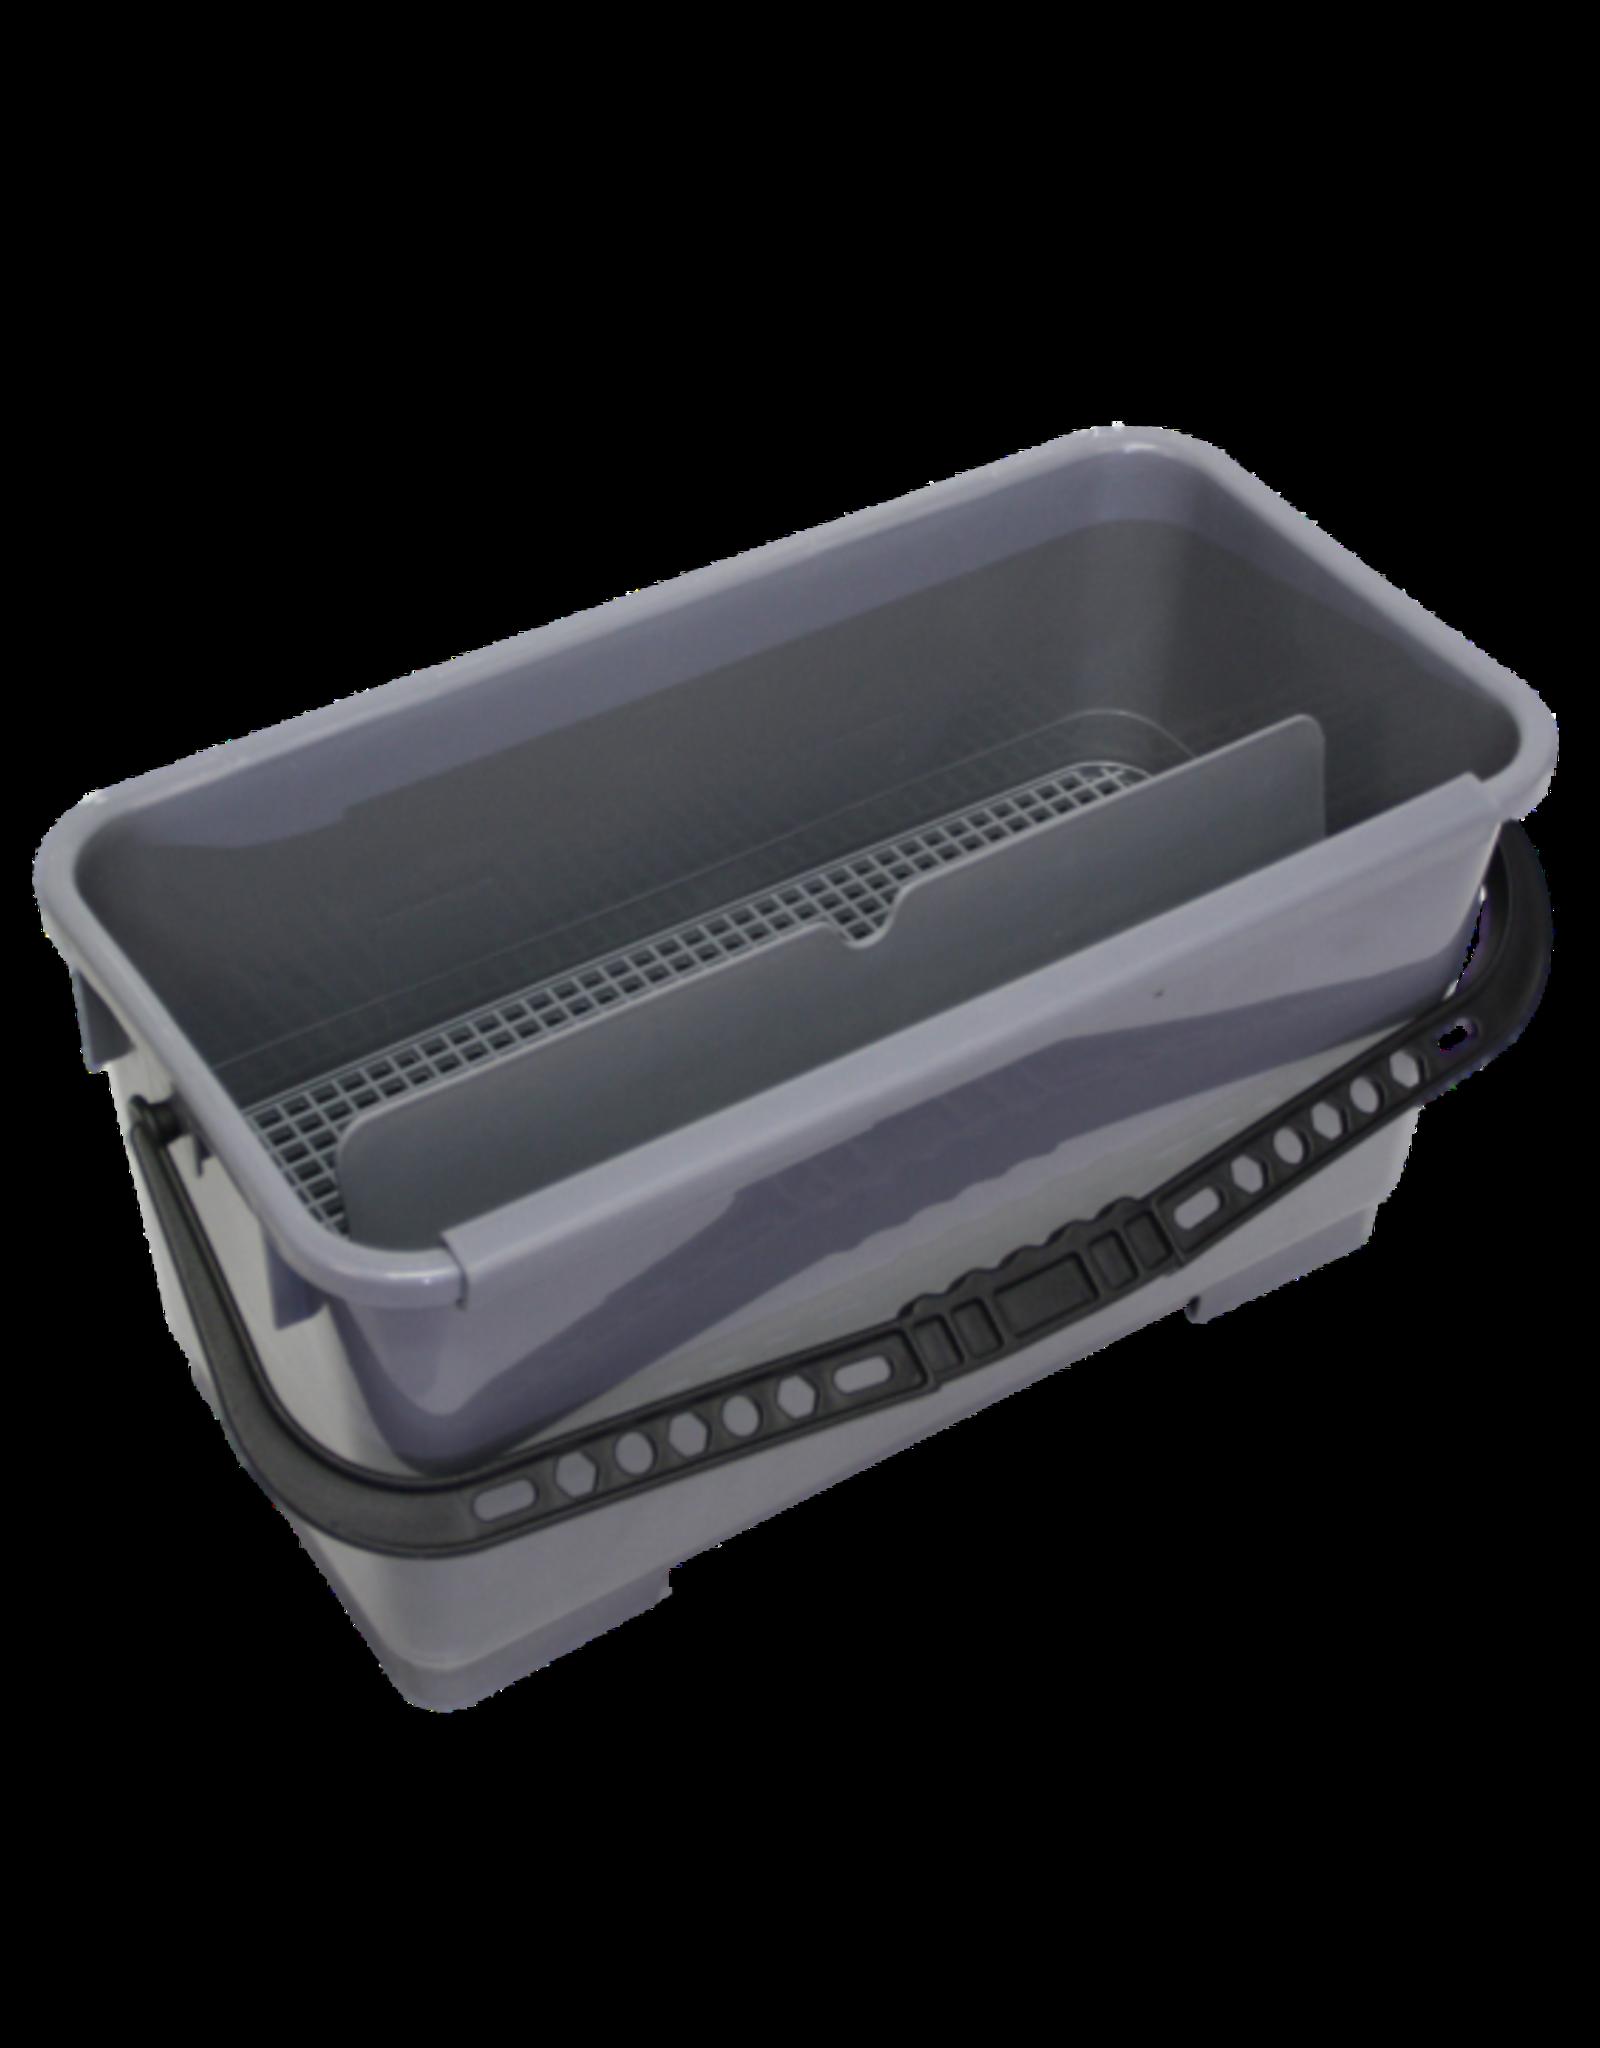 ACOR Rolemmer voor wasverdeling en glasbew. 20 ltr. incl. zeef & rooster